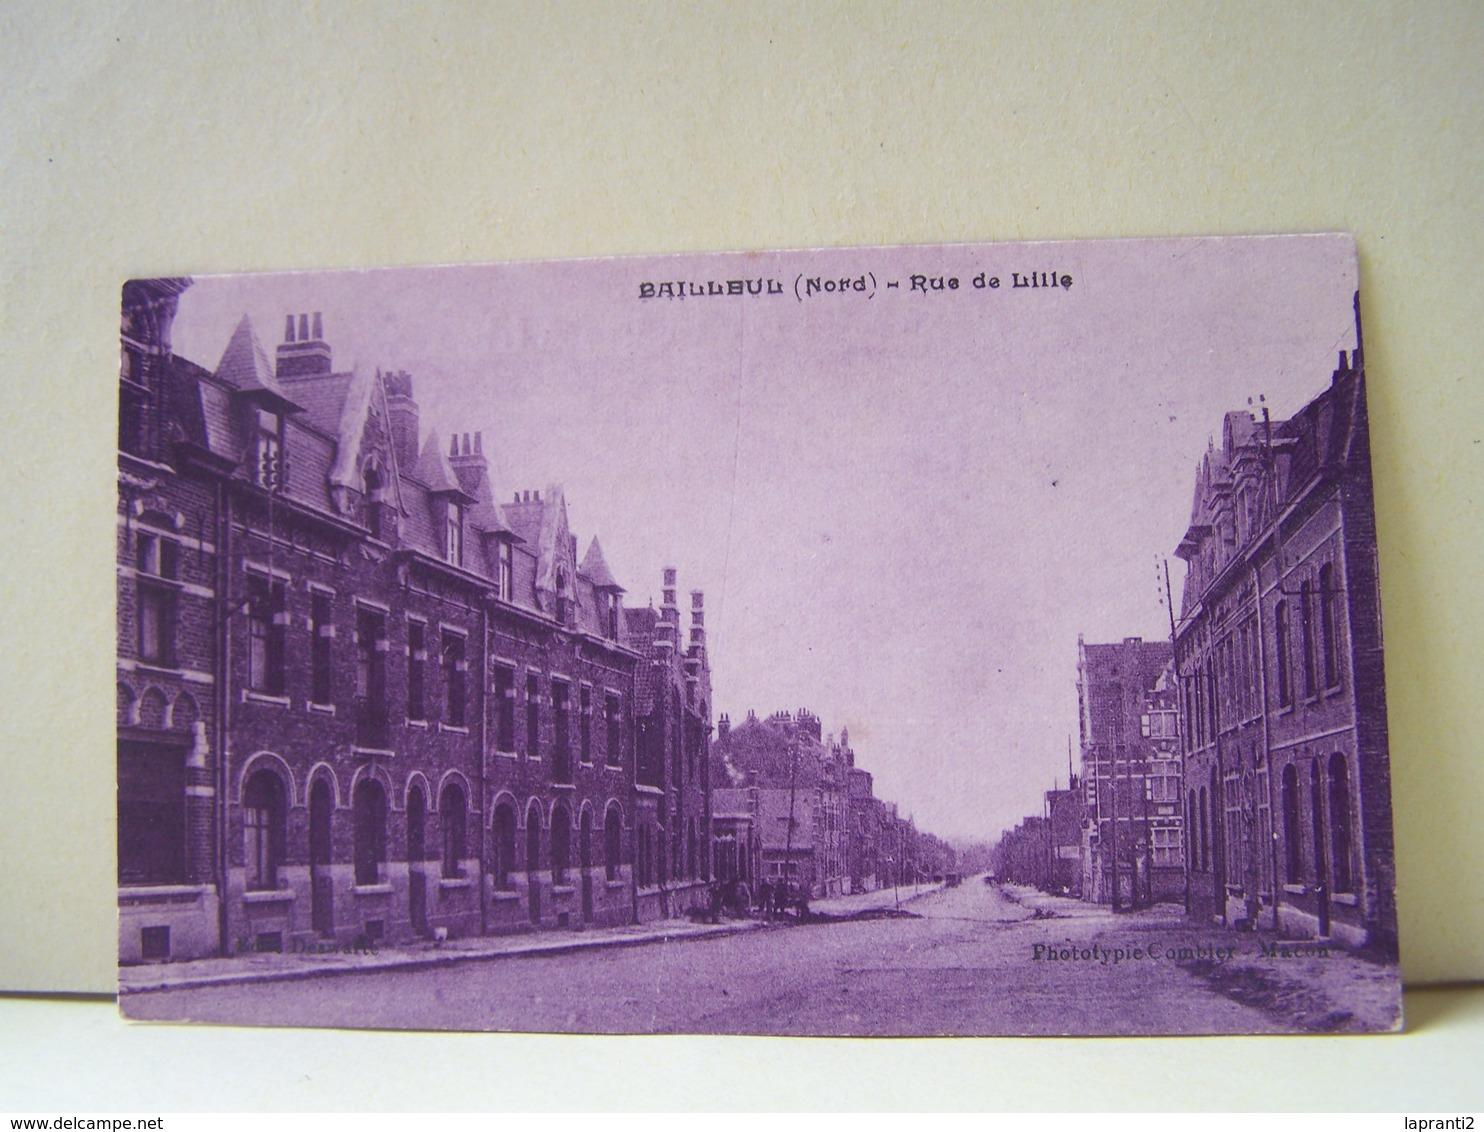 BAILLEUL (NORD) RUE DE LILLE. - Francia